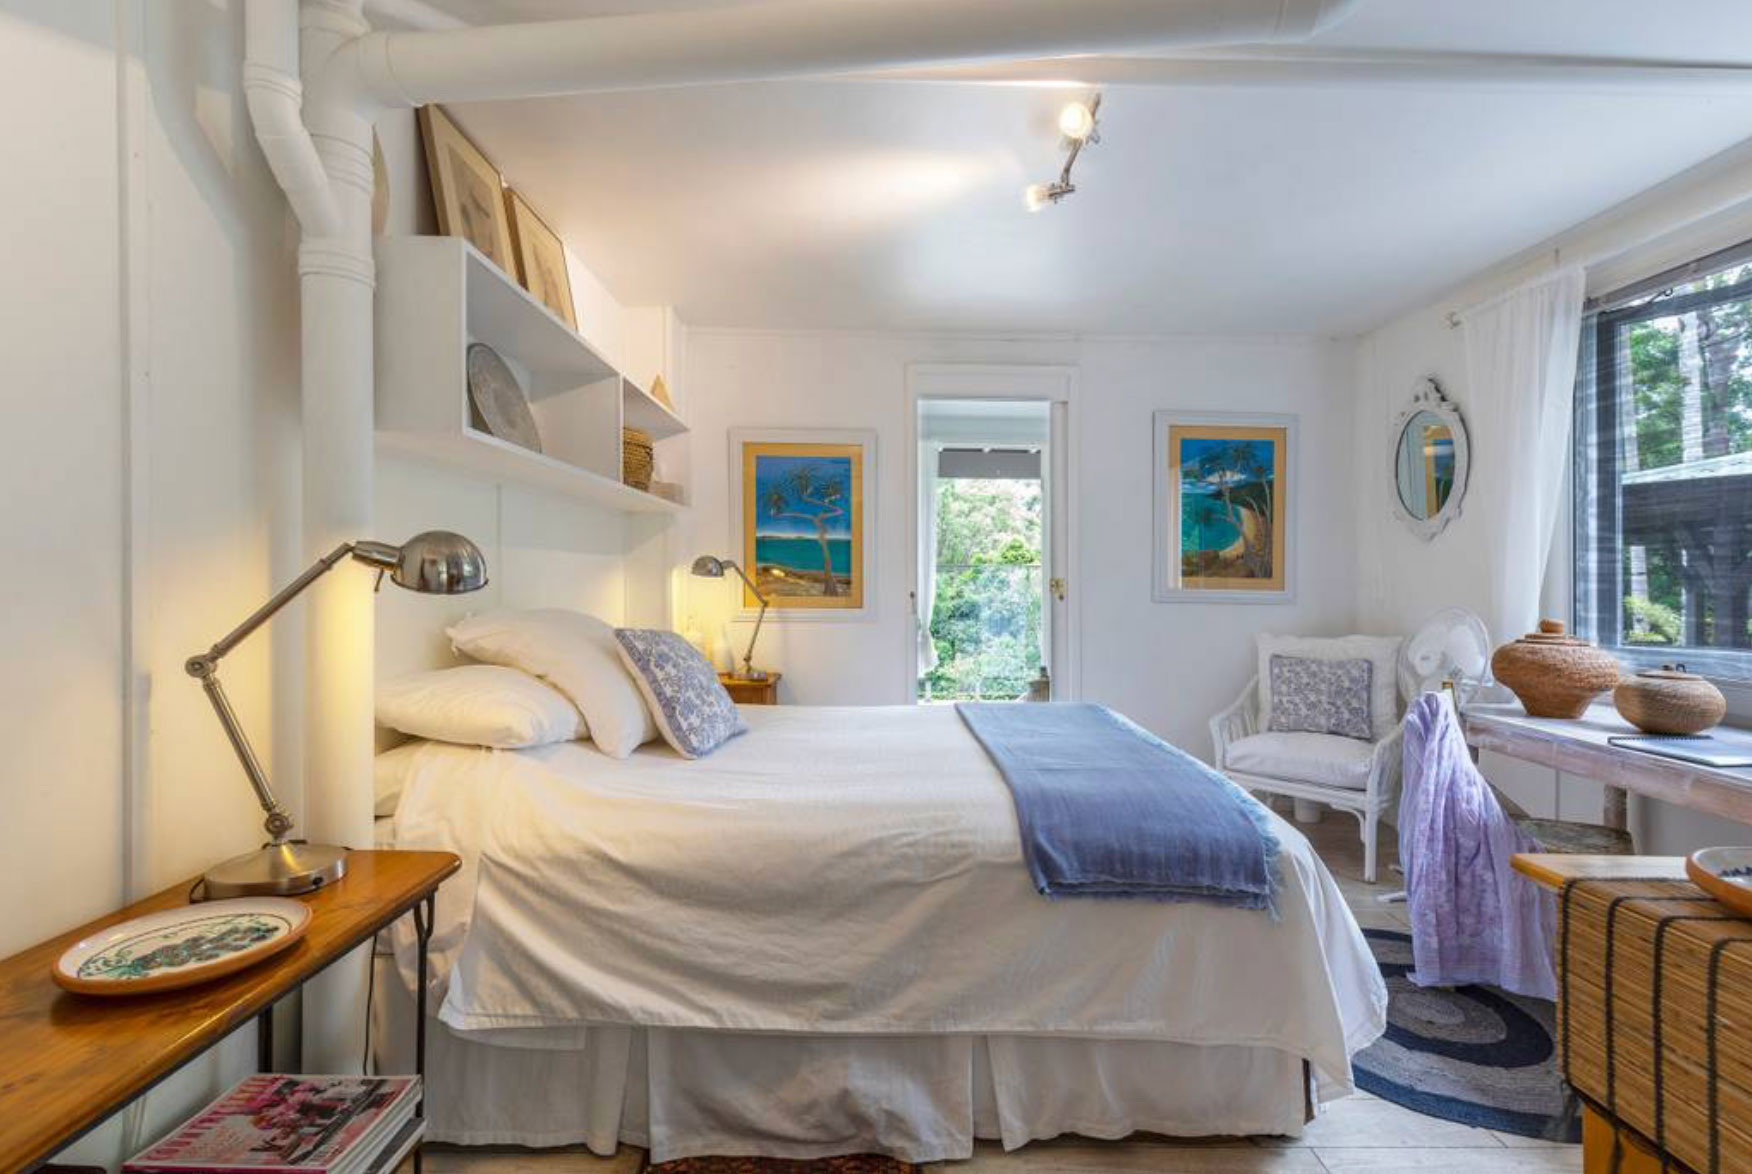 airbnb-apartment12.jpg